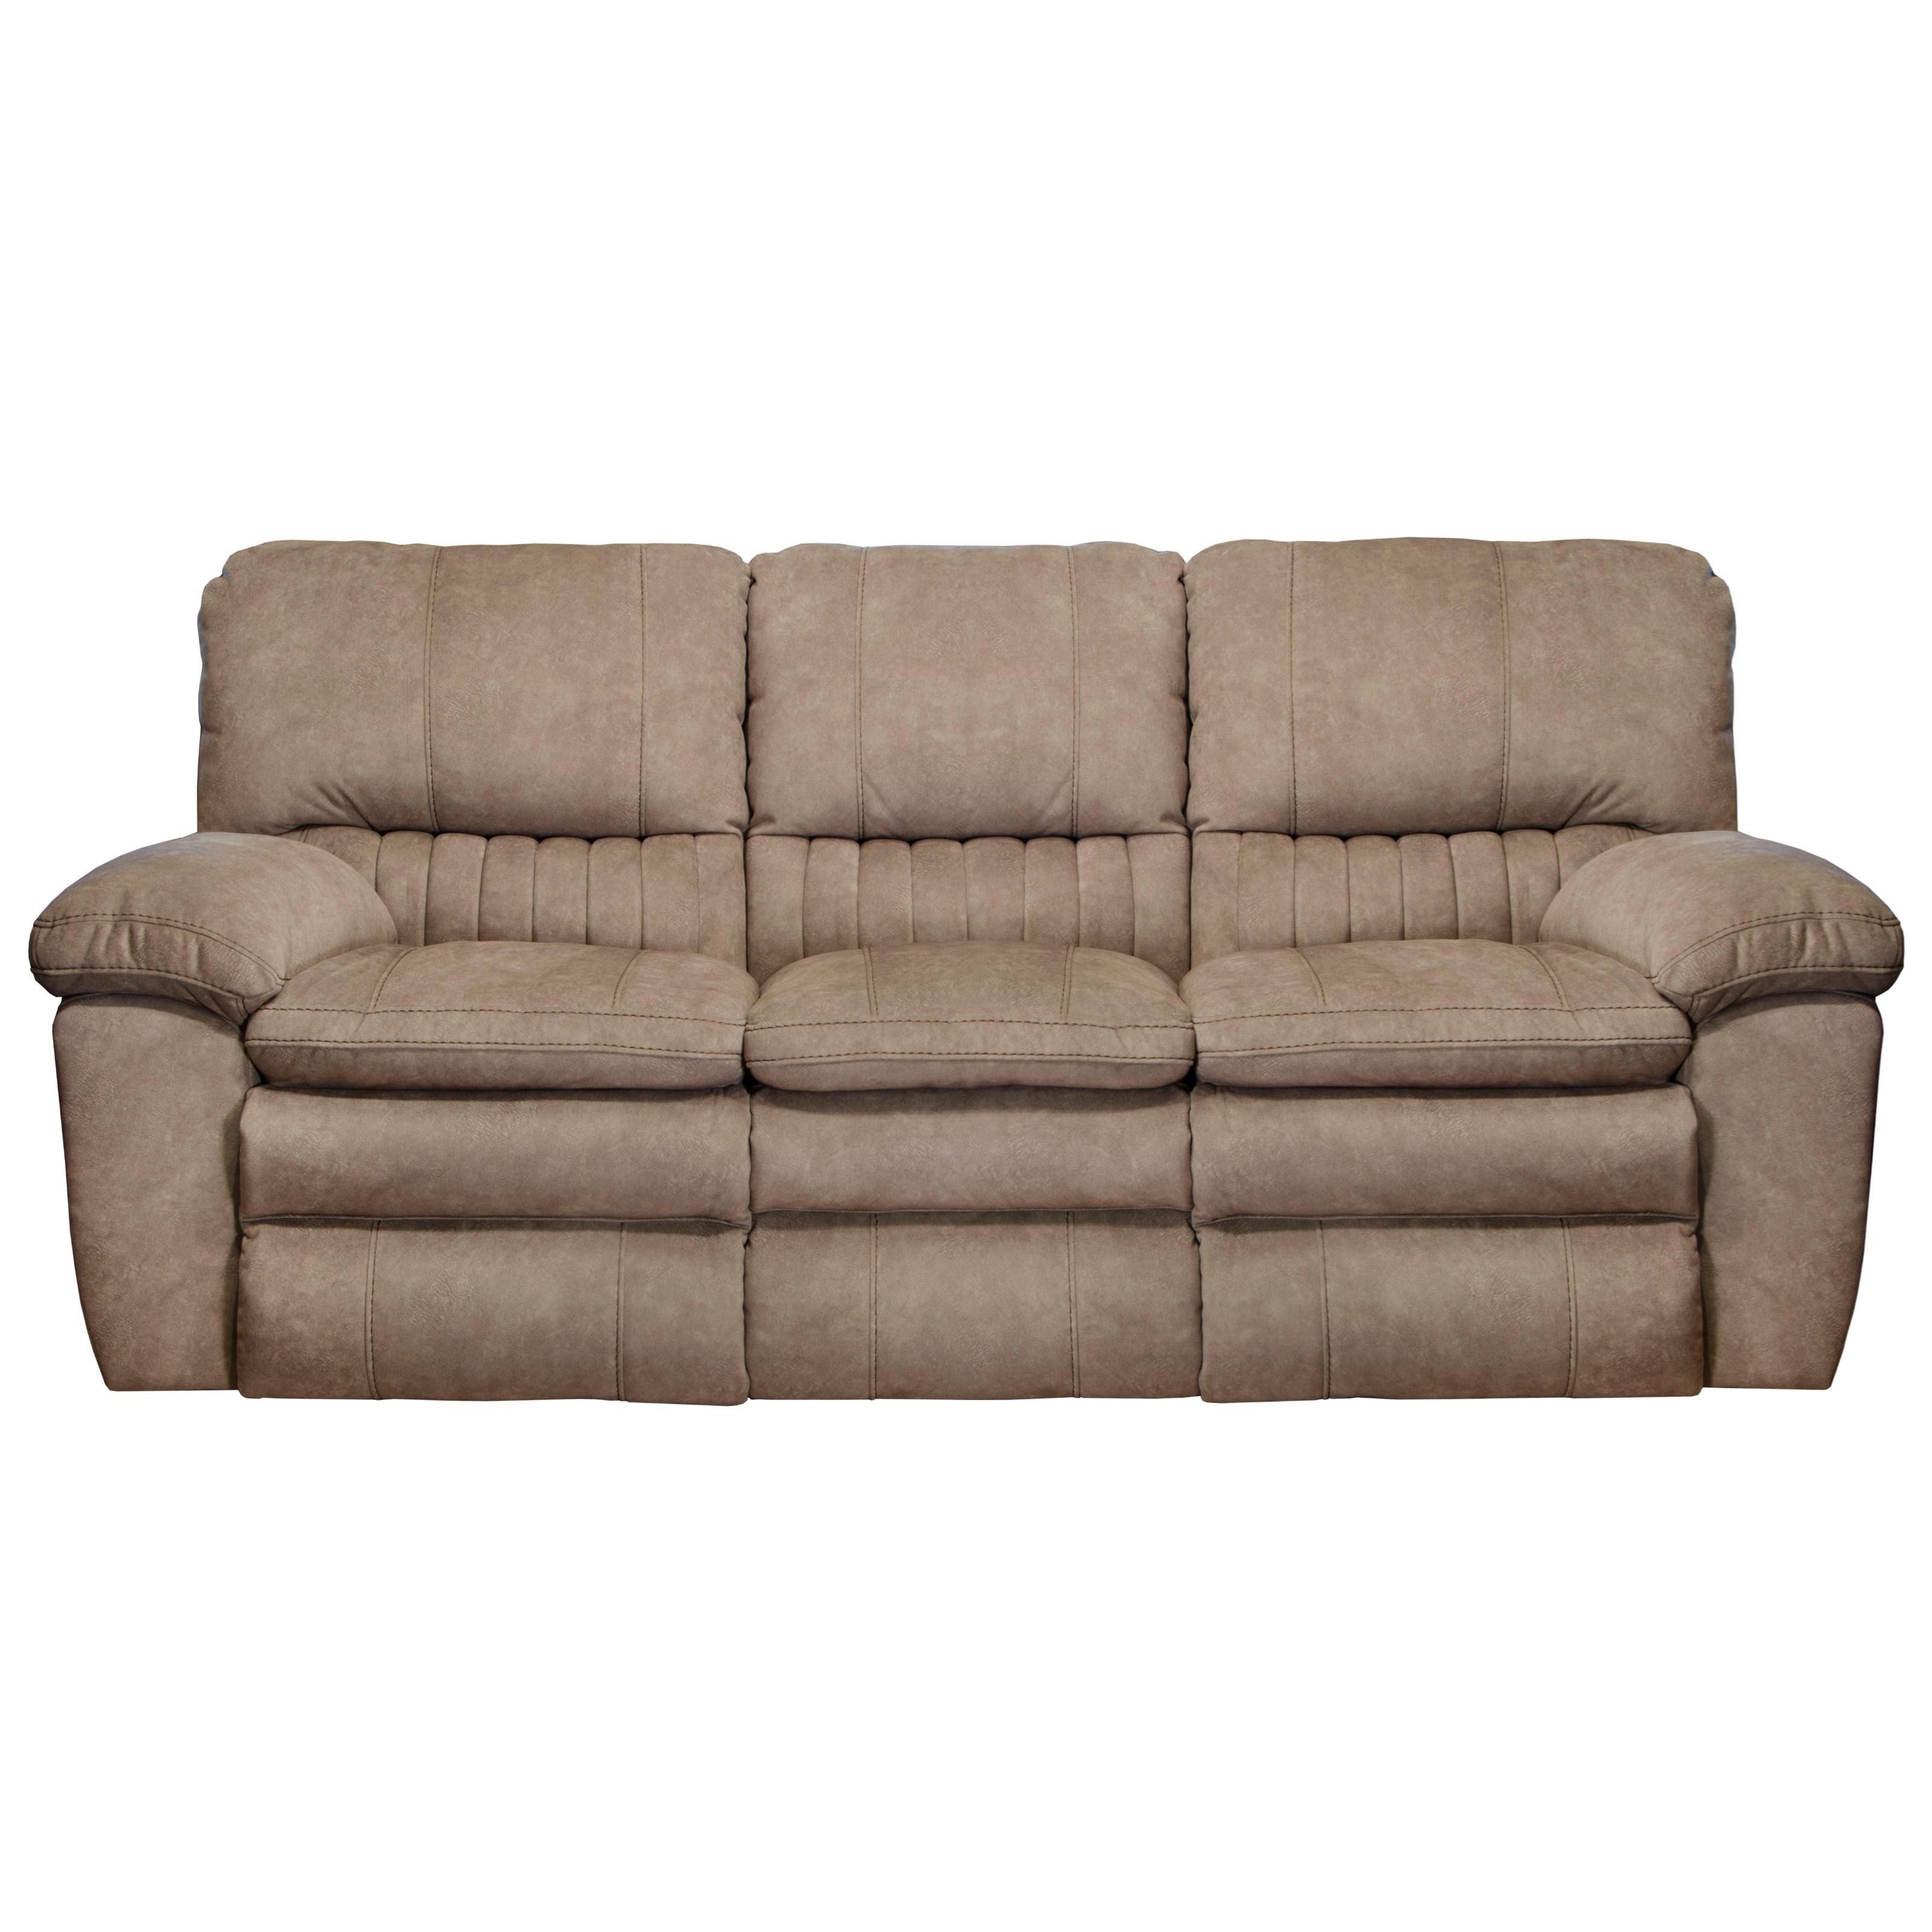 Catnapper ReyesPower Lay Flat Reclining Sofa ...